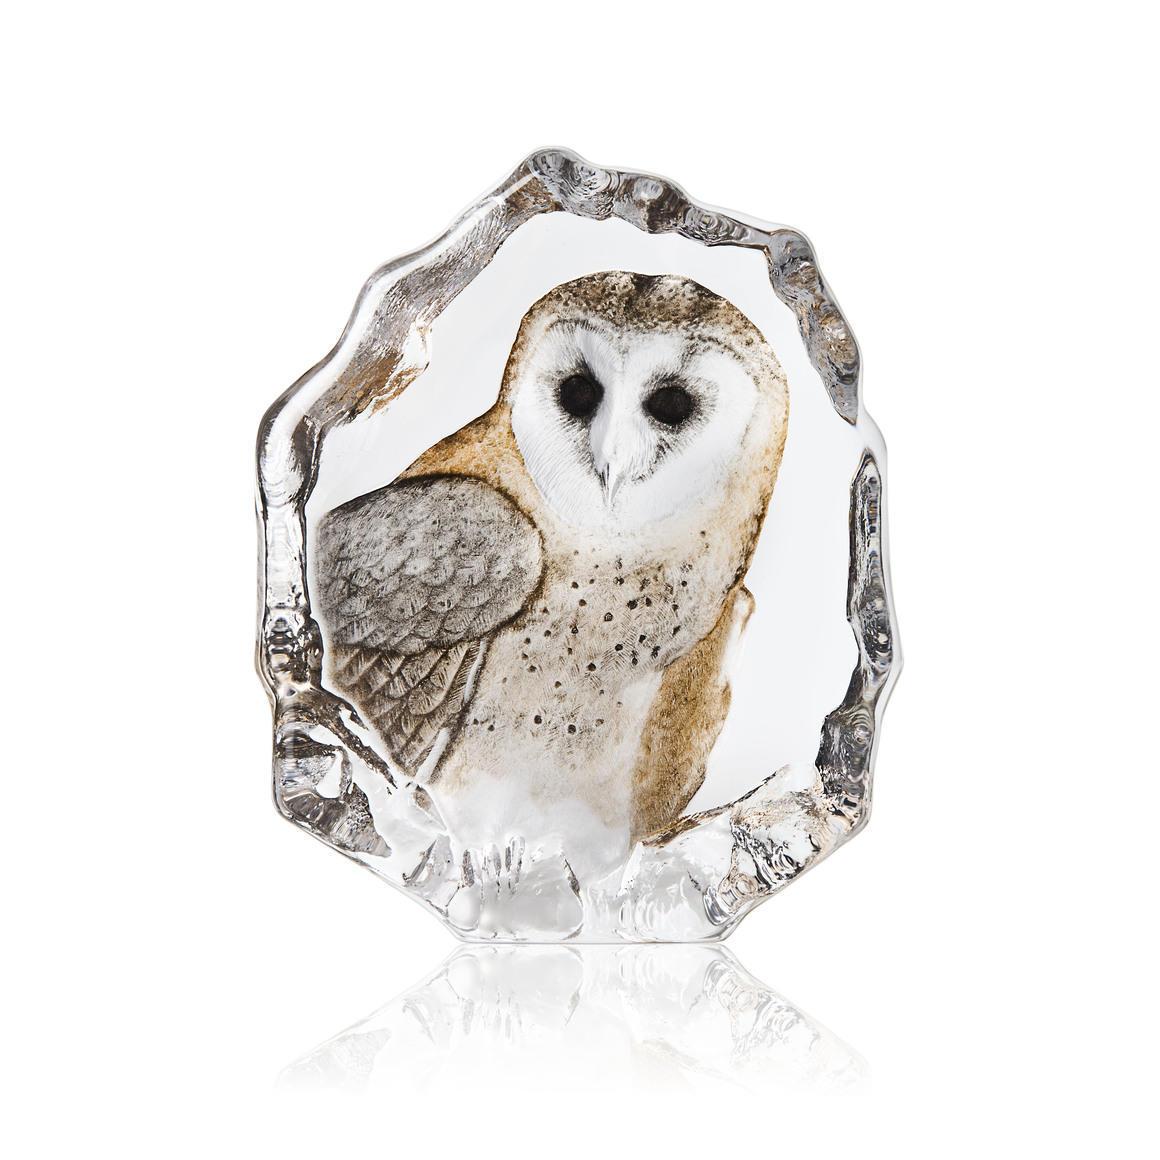 Barn Owl | Trada Marketplace